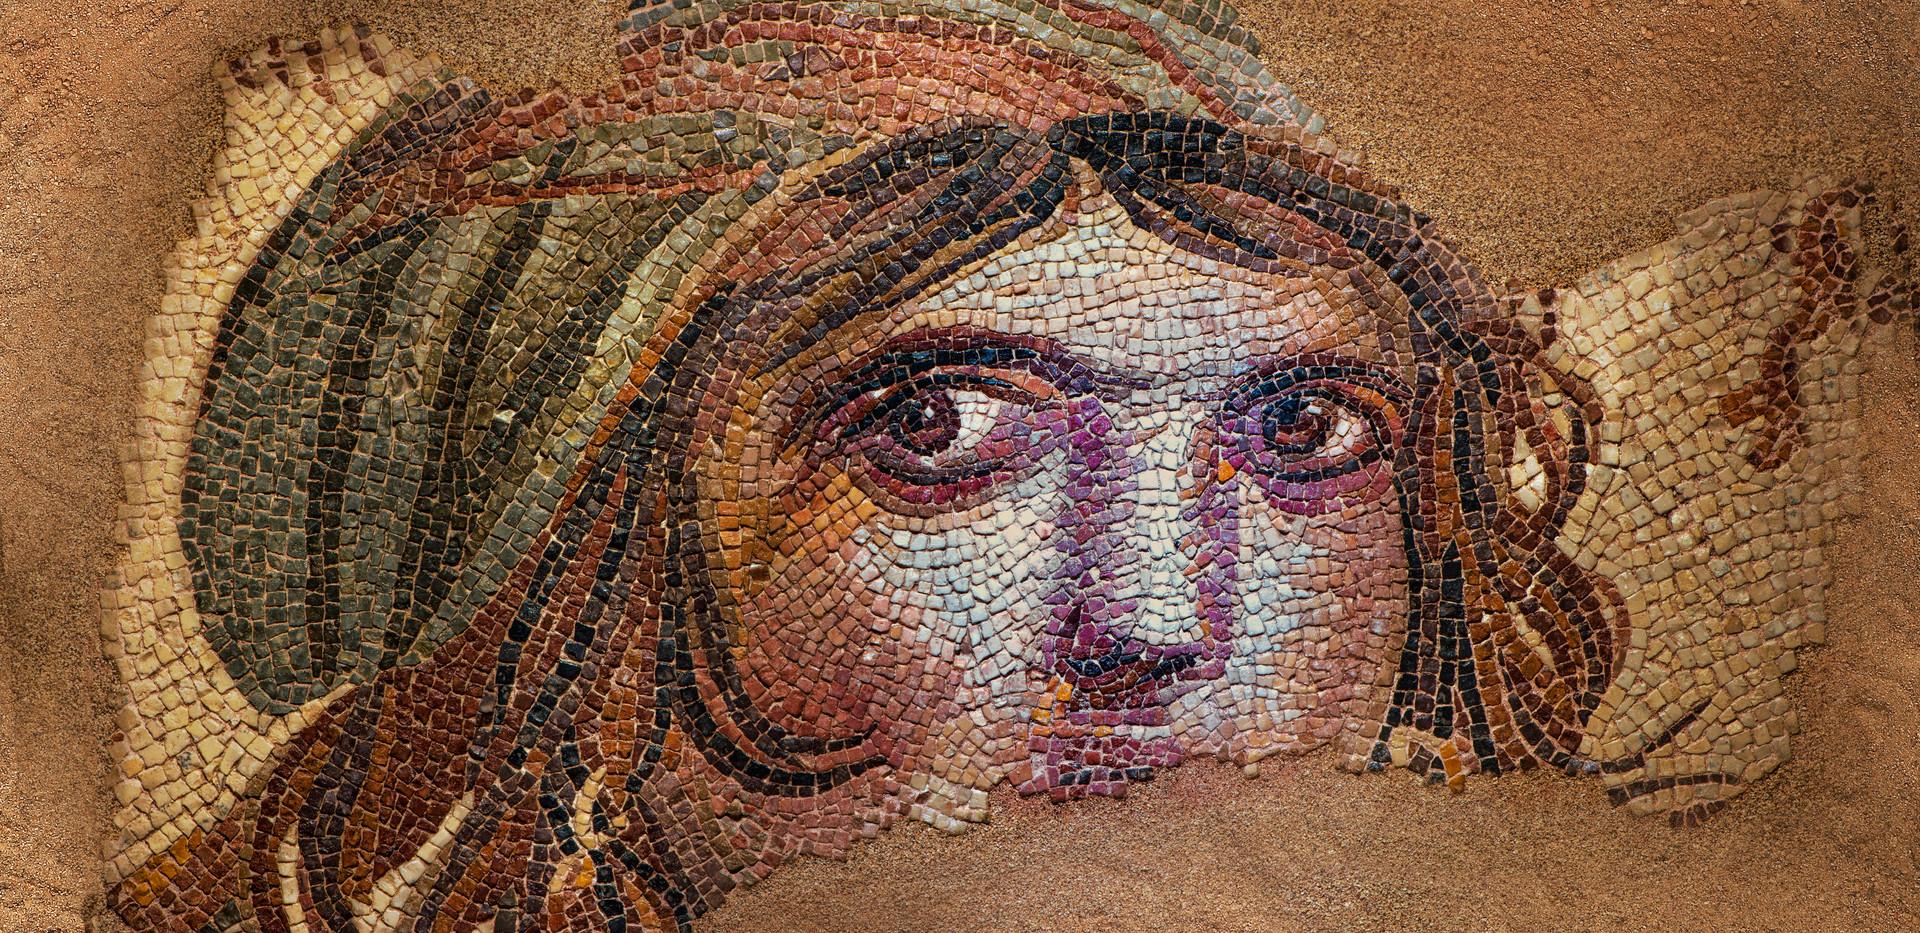 ZEUGMA MOSAIC MUSEUM / GAZIANTEP